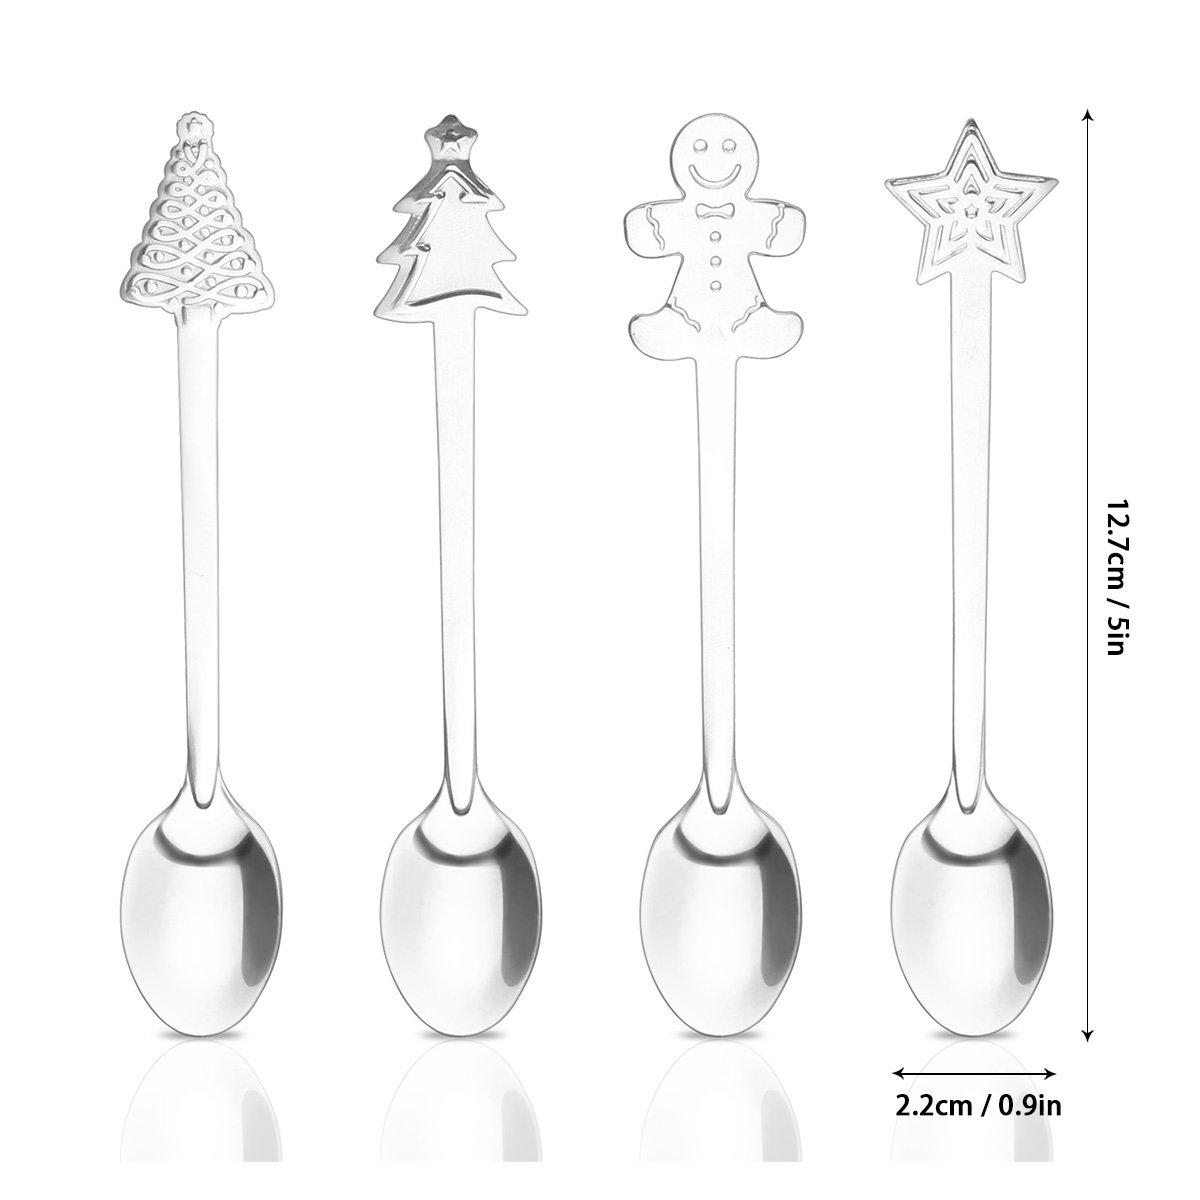 DEBEME Cuchara 4 piezas Juego de cucharas navide/ñas de acero inoxidable Caf/é T/é Postre Bebida Cuchara mezcladora Taza colgante Cuchara Gadget para cocina